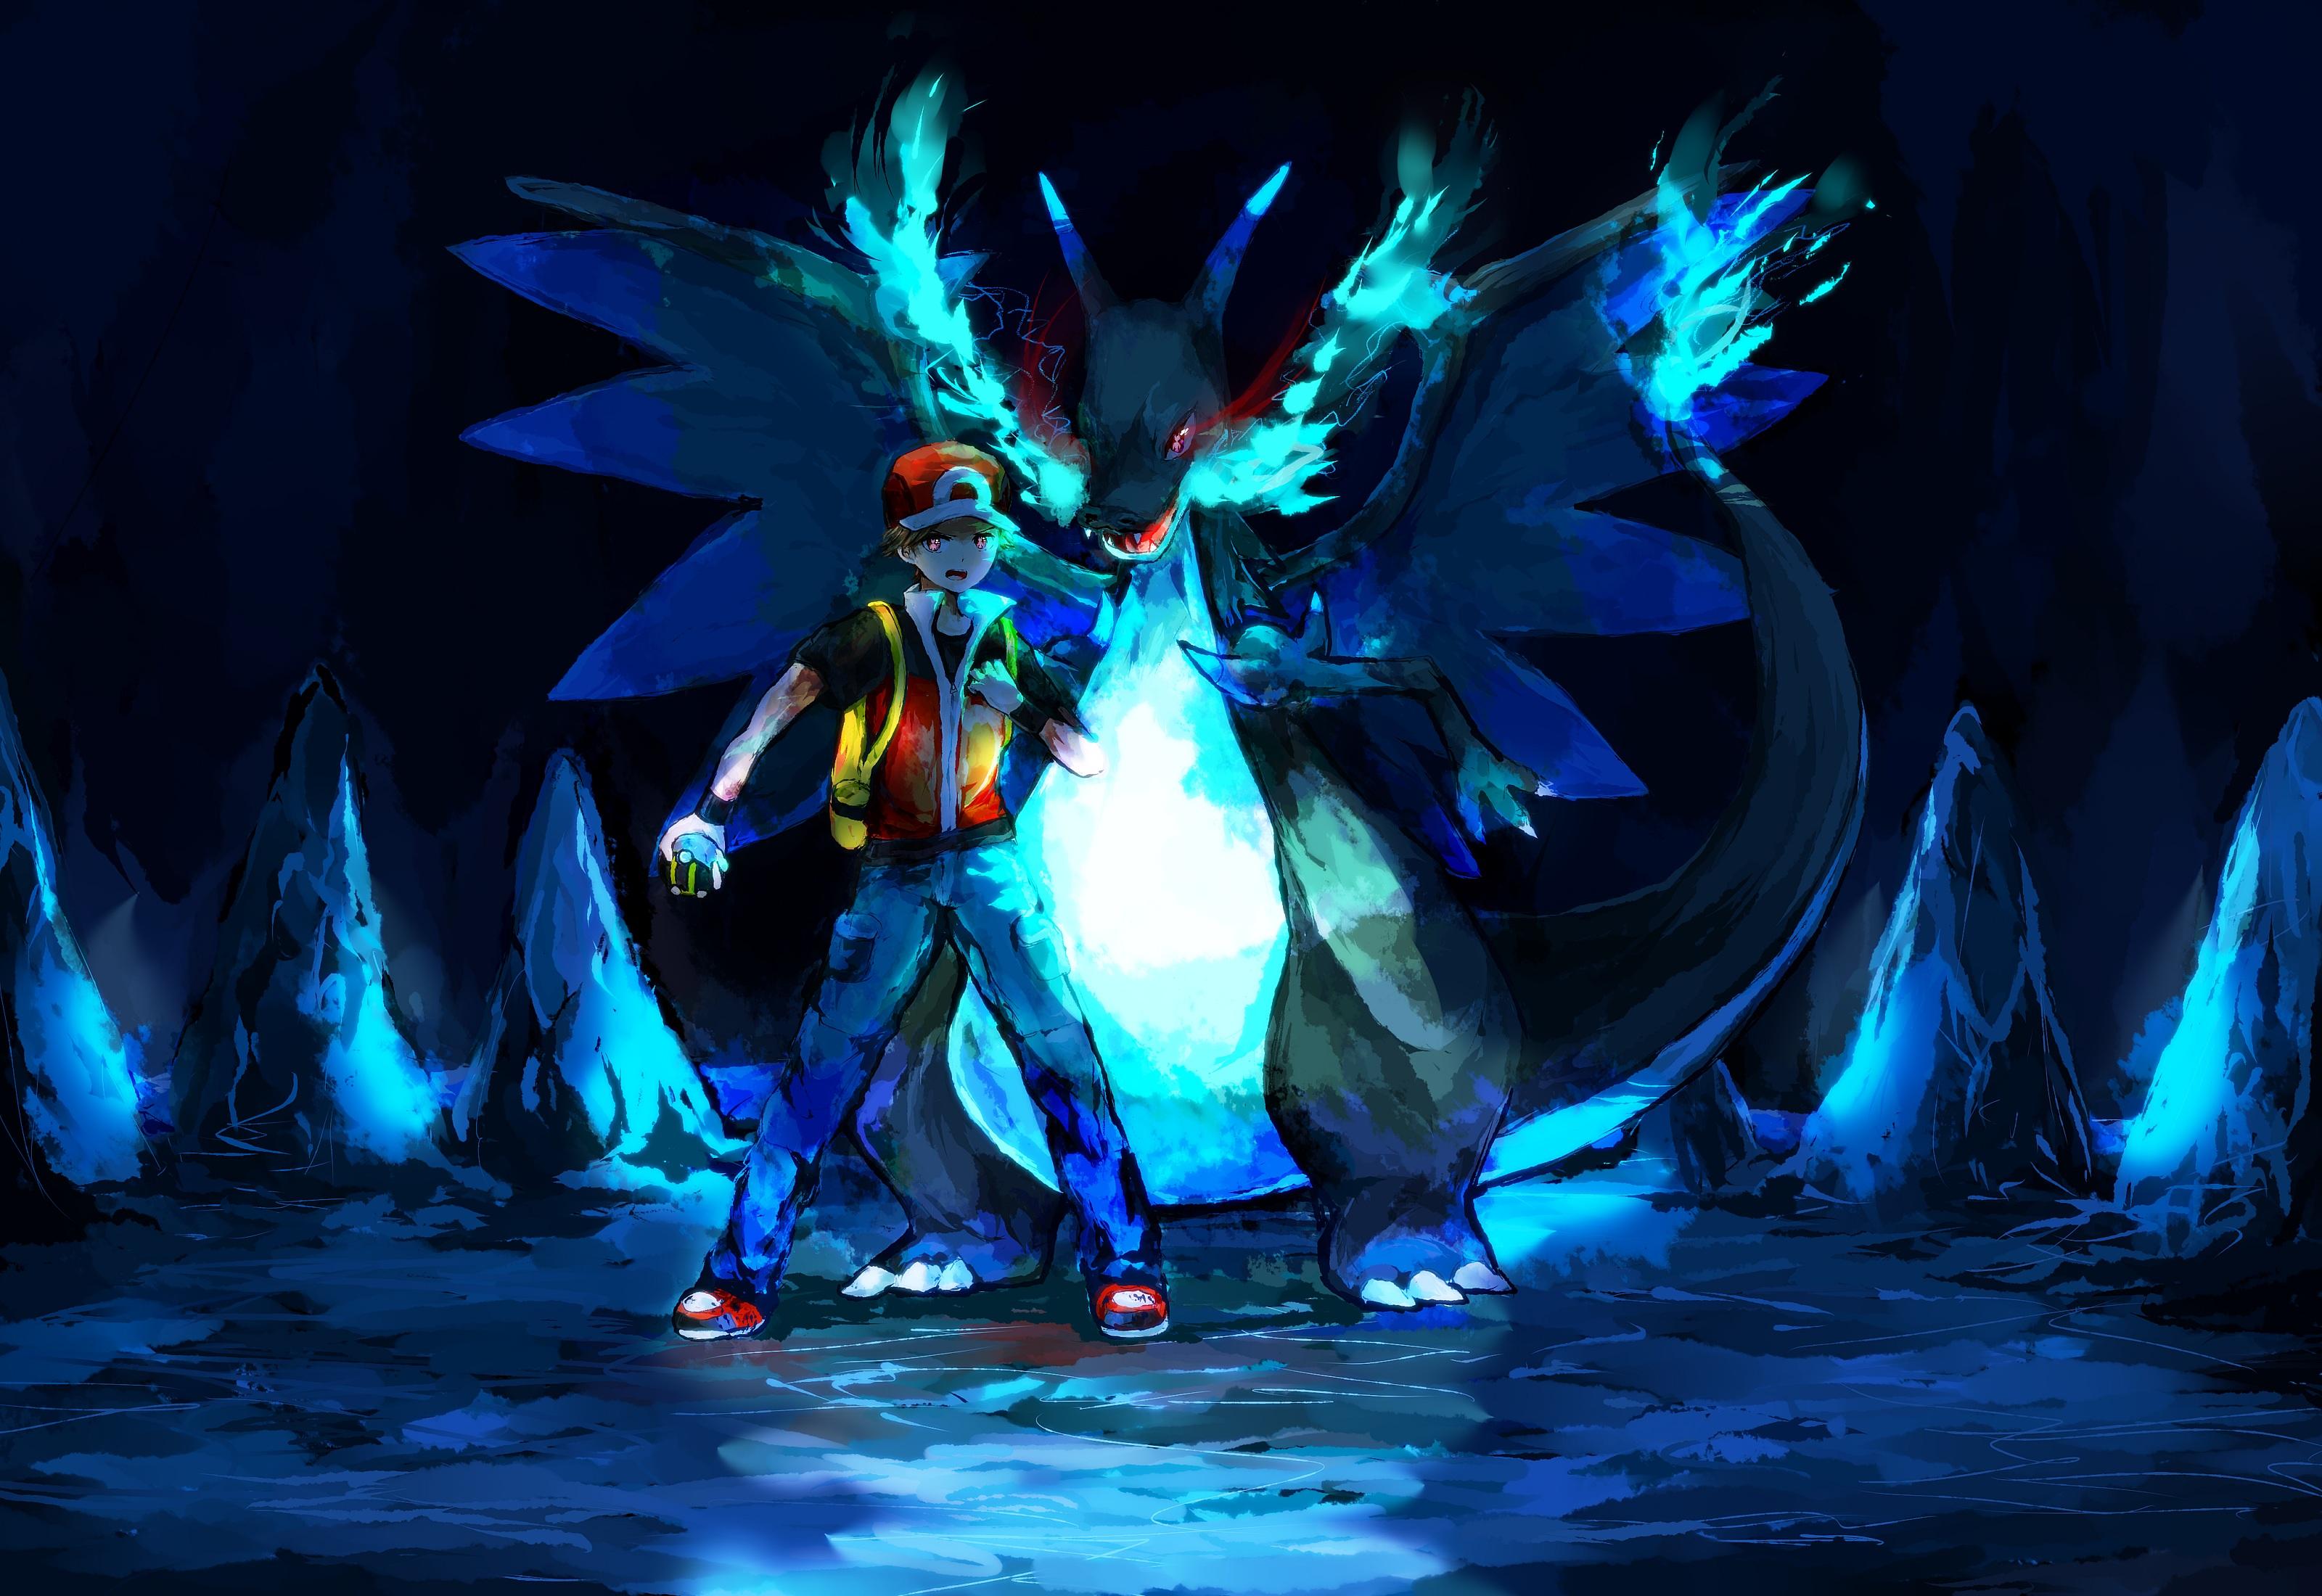 Pokemon Trainer Red Wallpaper 3200x2200